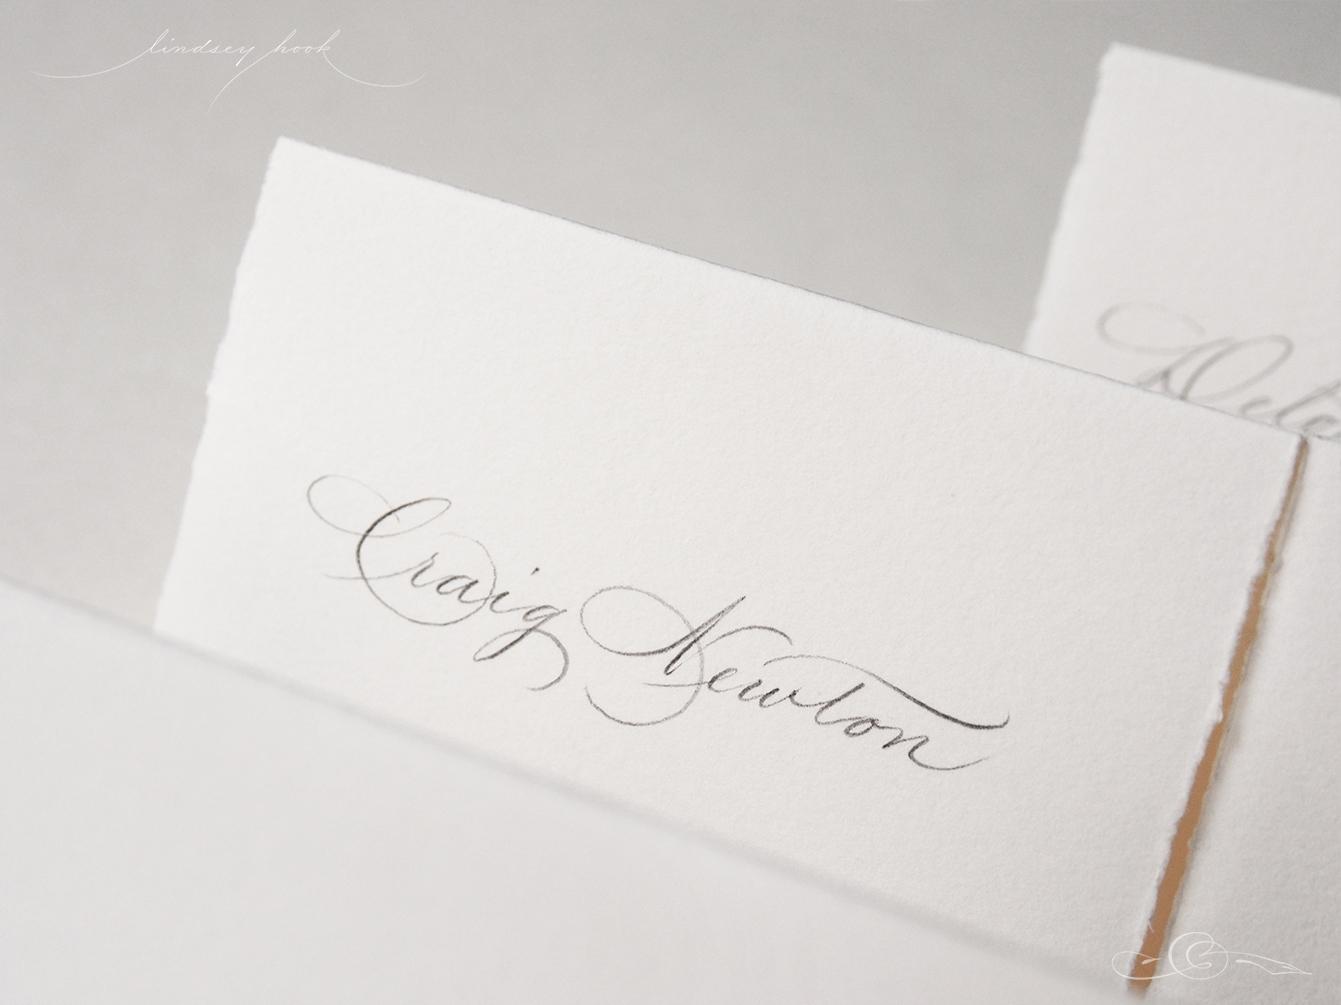 Spencerian Name Card